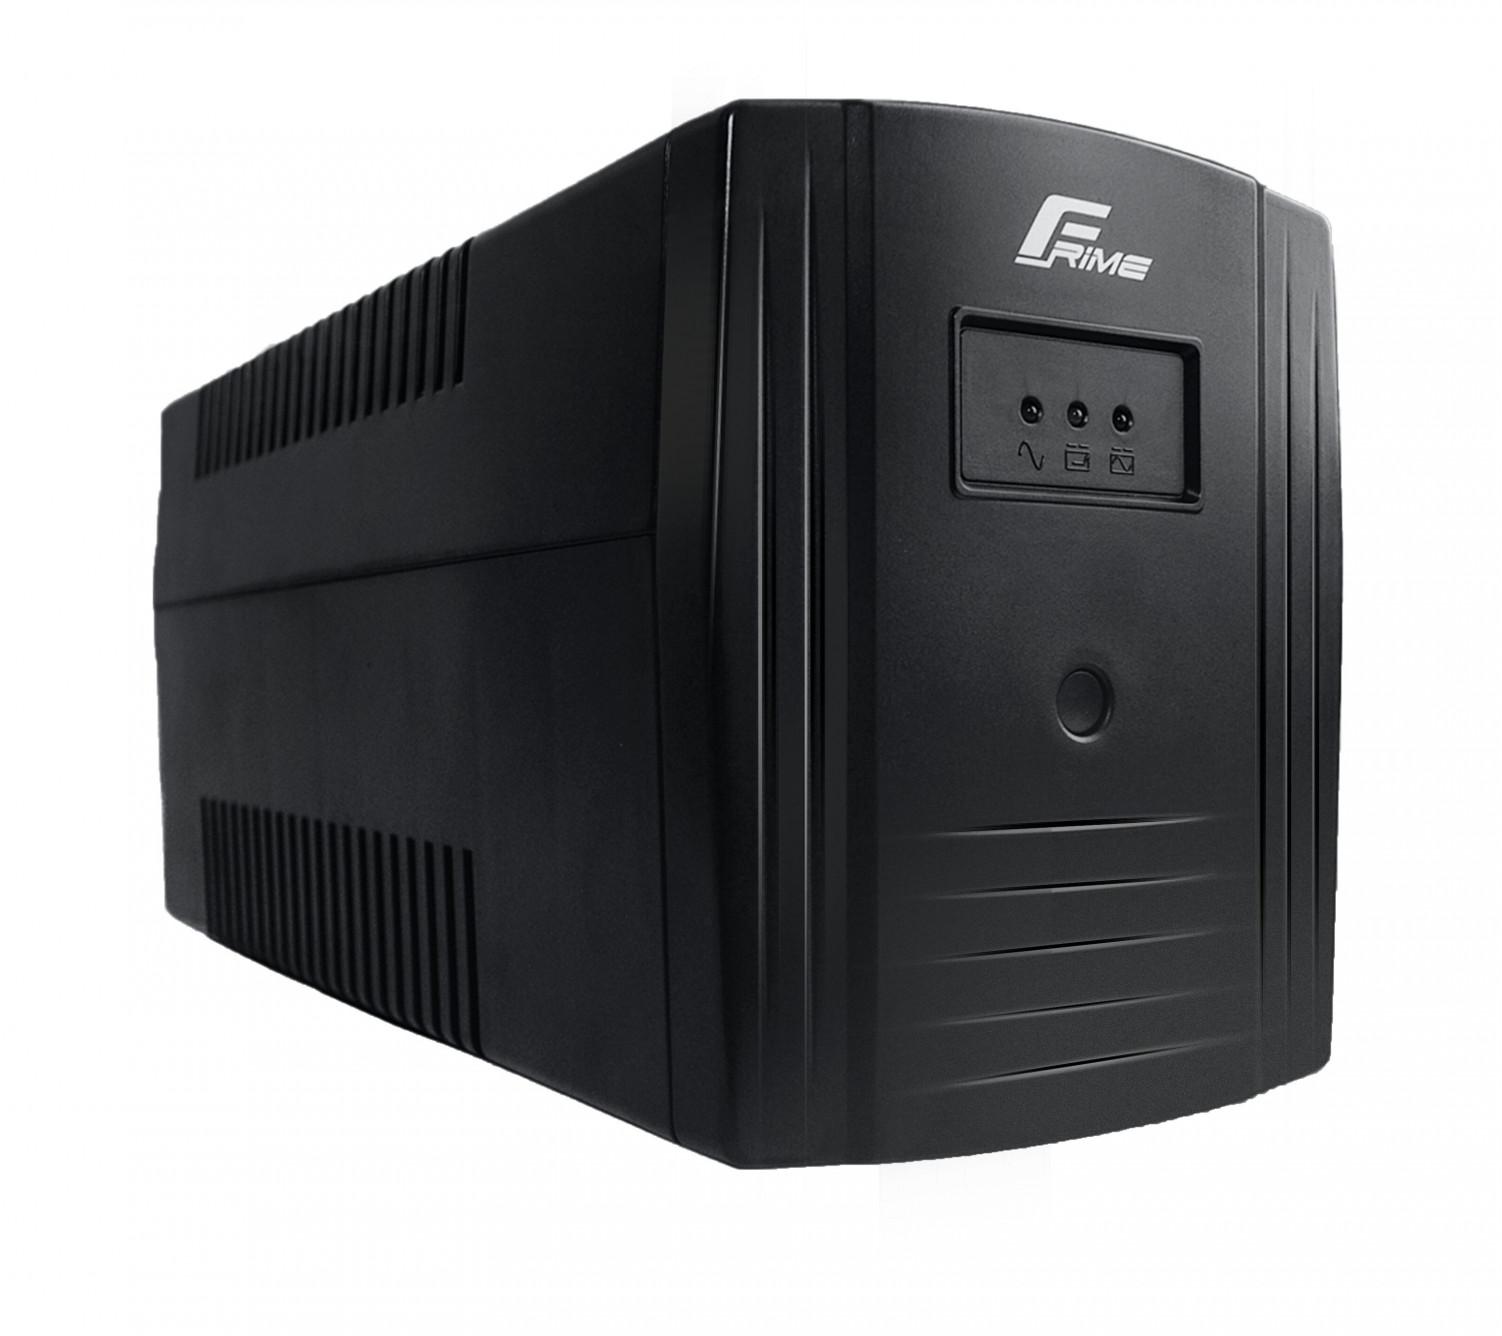 ИБП Frime Standart 650VA